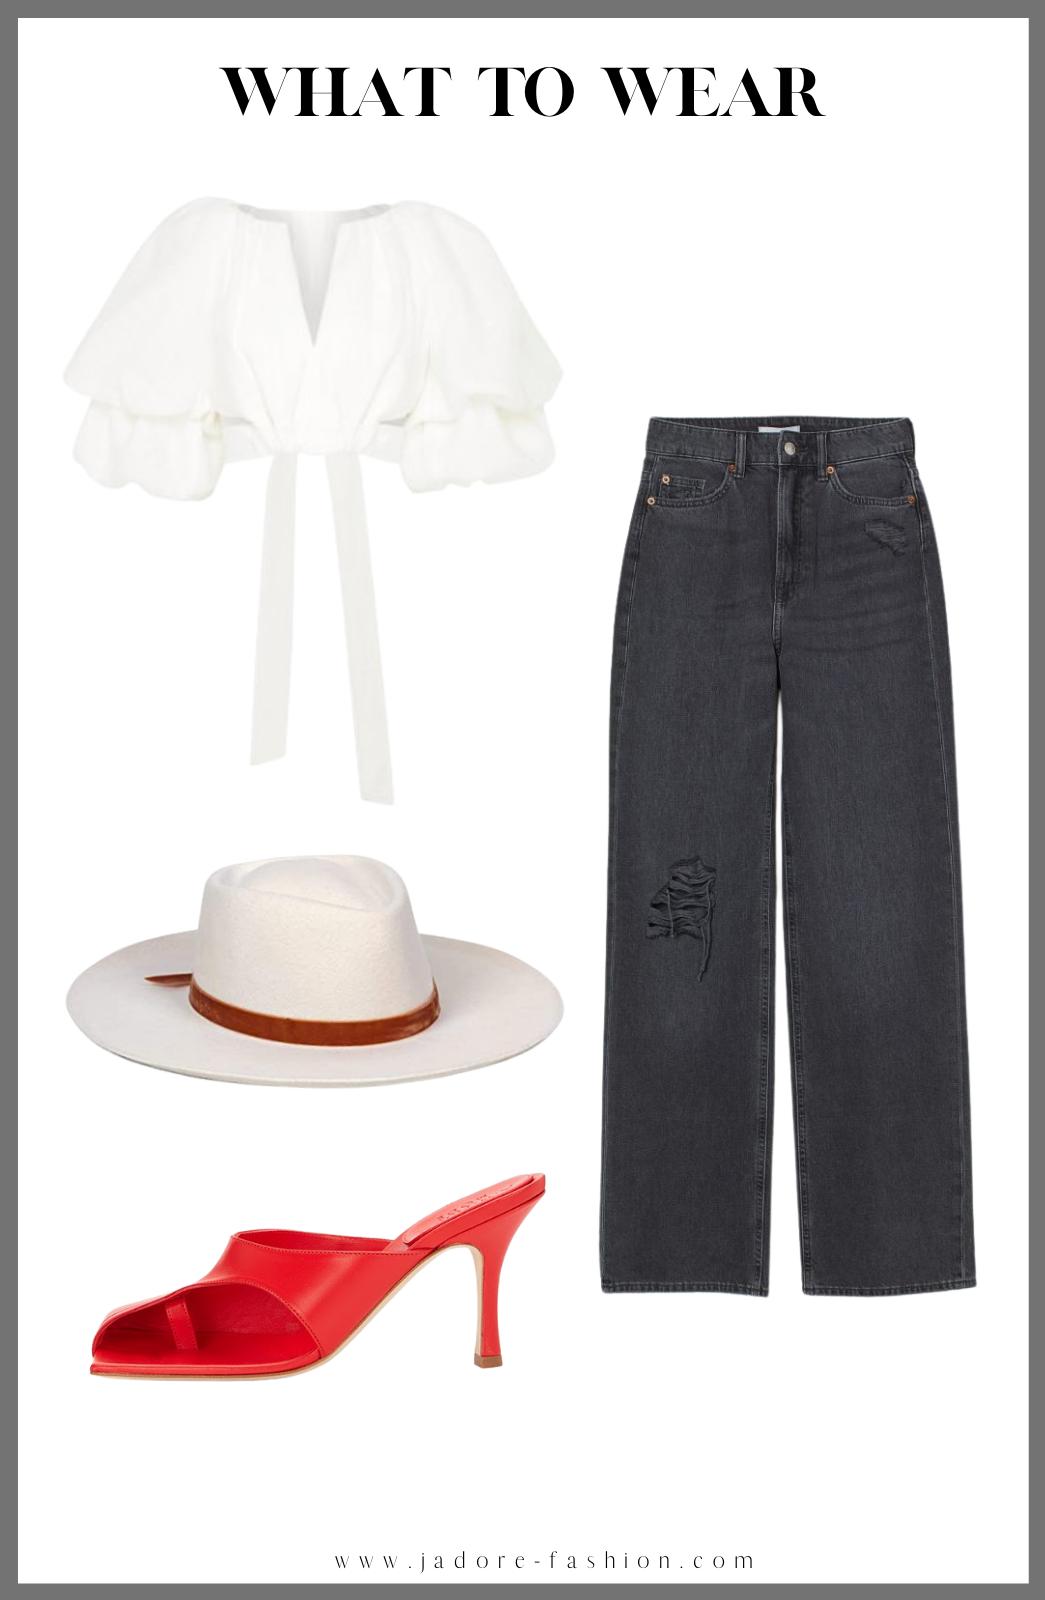 Stella-adewunmi-of-jadore-fashion-blog-share-loose-jeans-crop-top-mules